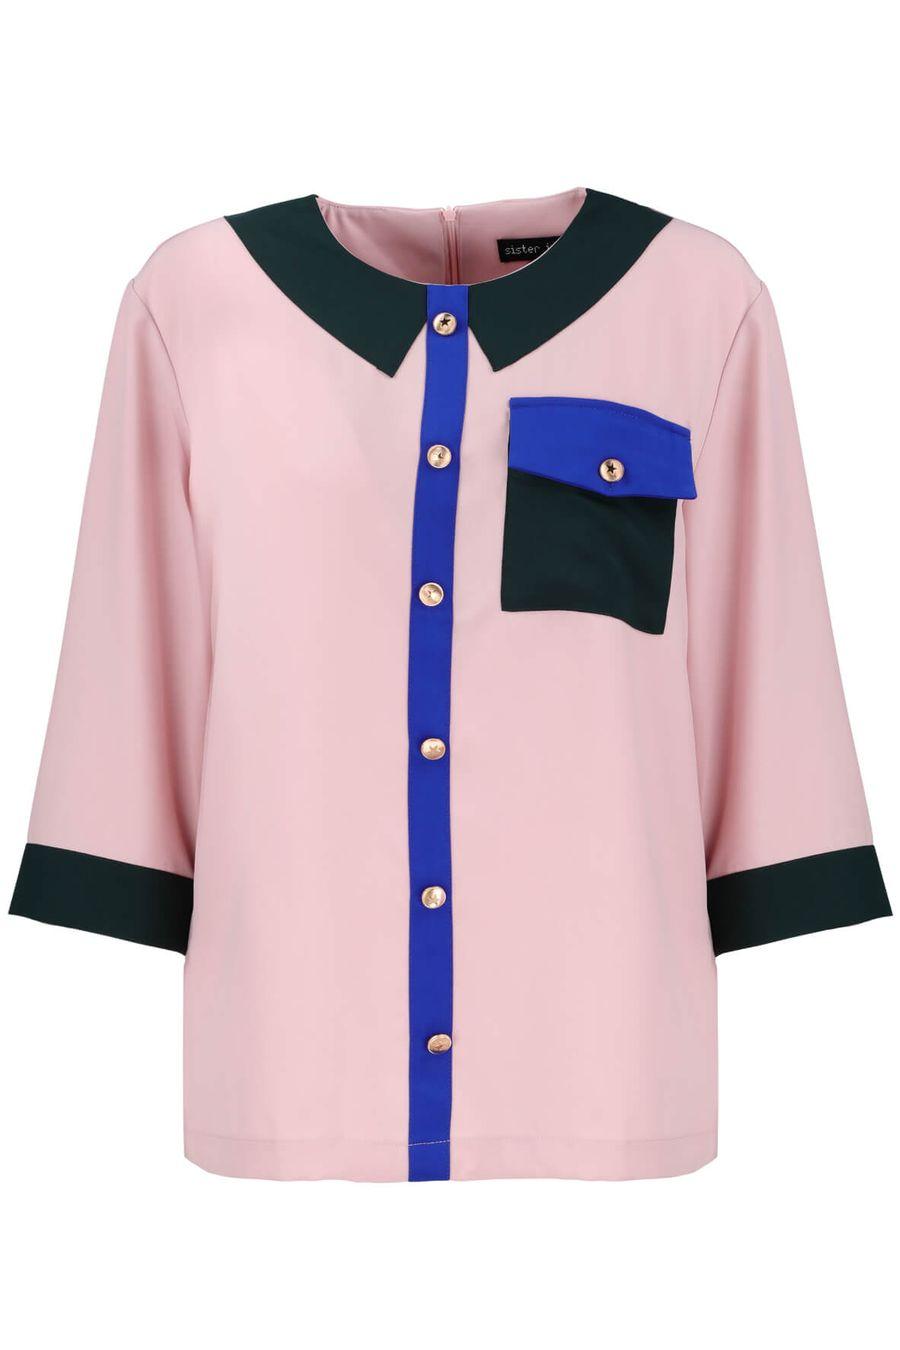 sister-jane-bashful-colourblock-blouse-1